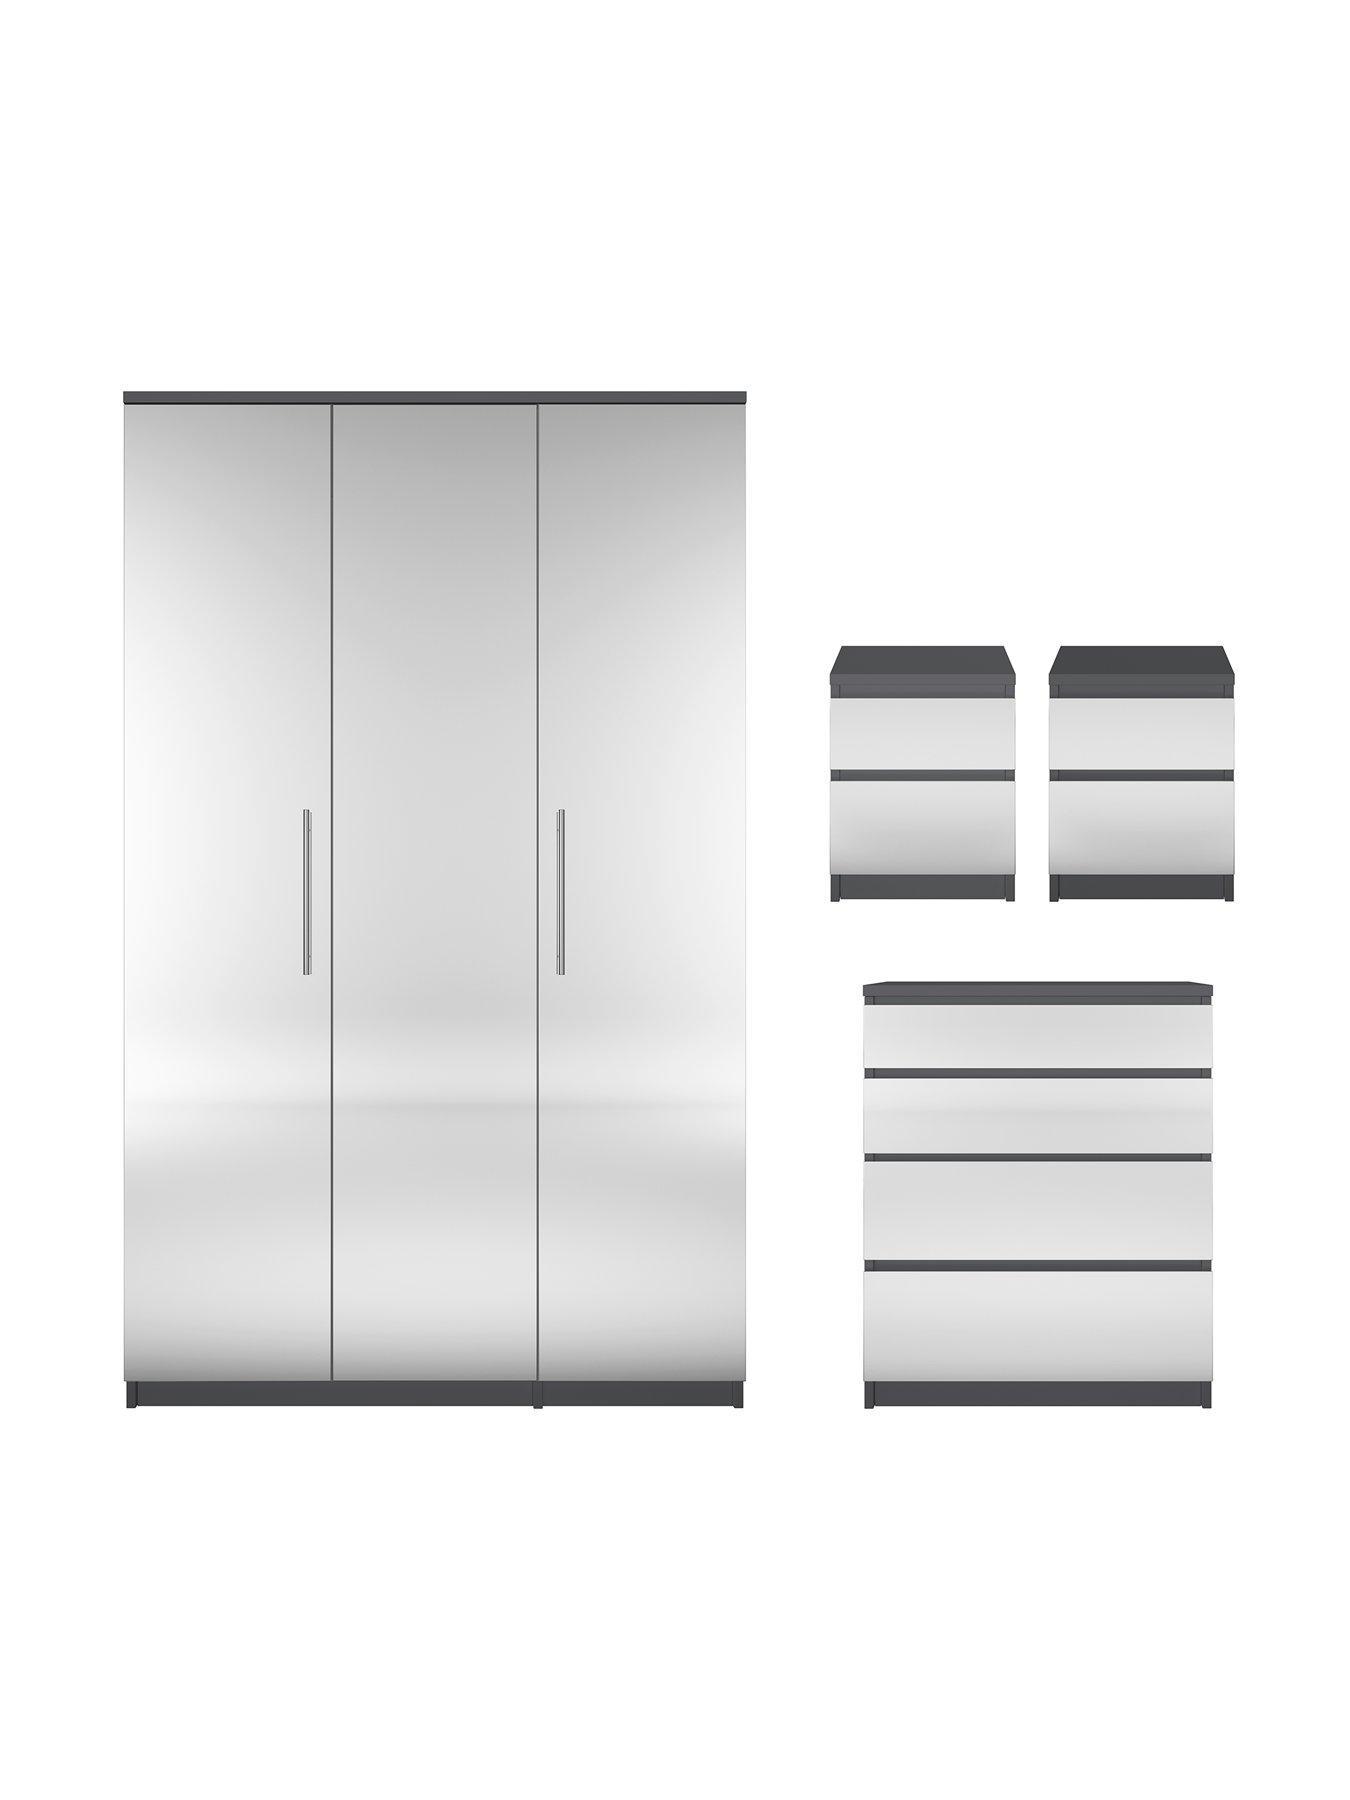 Timber Art Design 3 Piece Bedroom Furniture Set Wardrobe Chest Drawers Bedside Table White